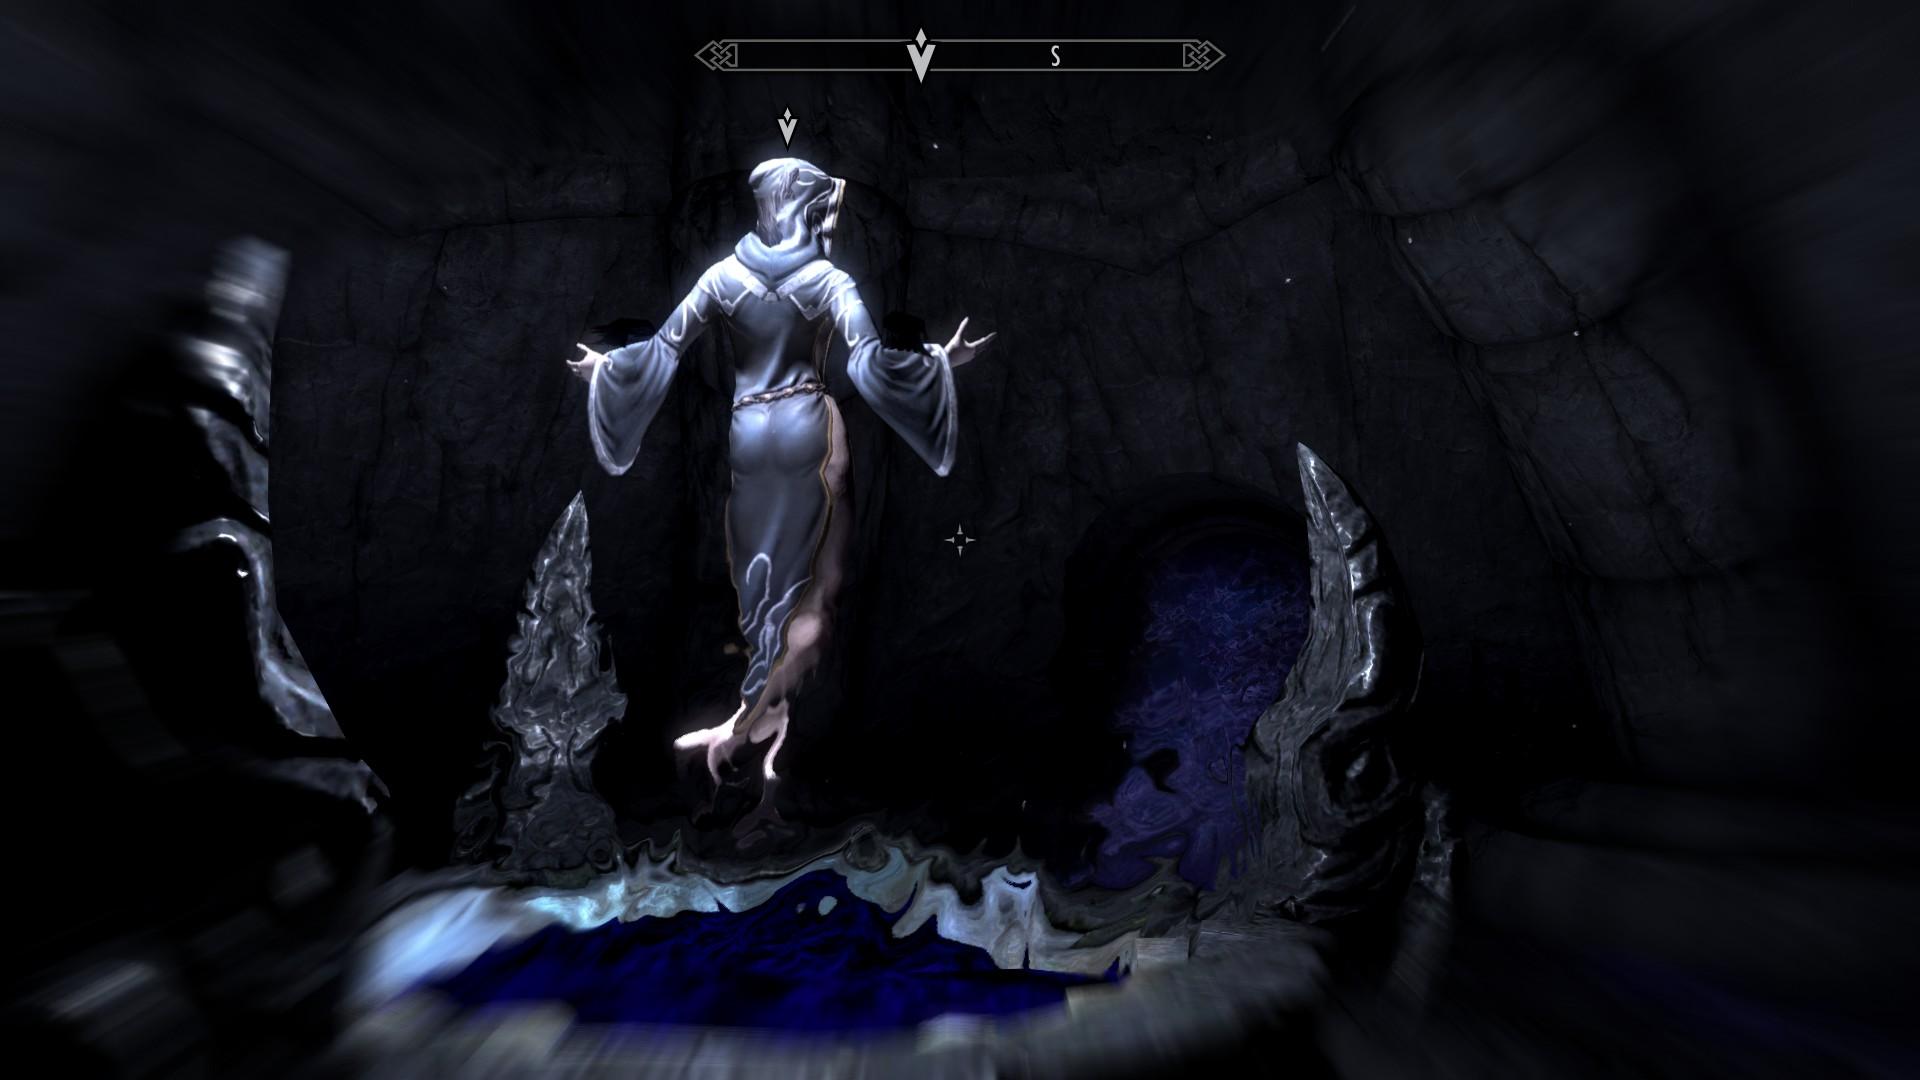 20180616152855_1.jpg - Elder Scrolls 5: Skyrim, the